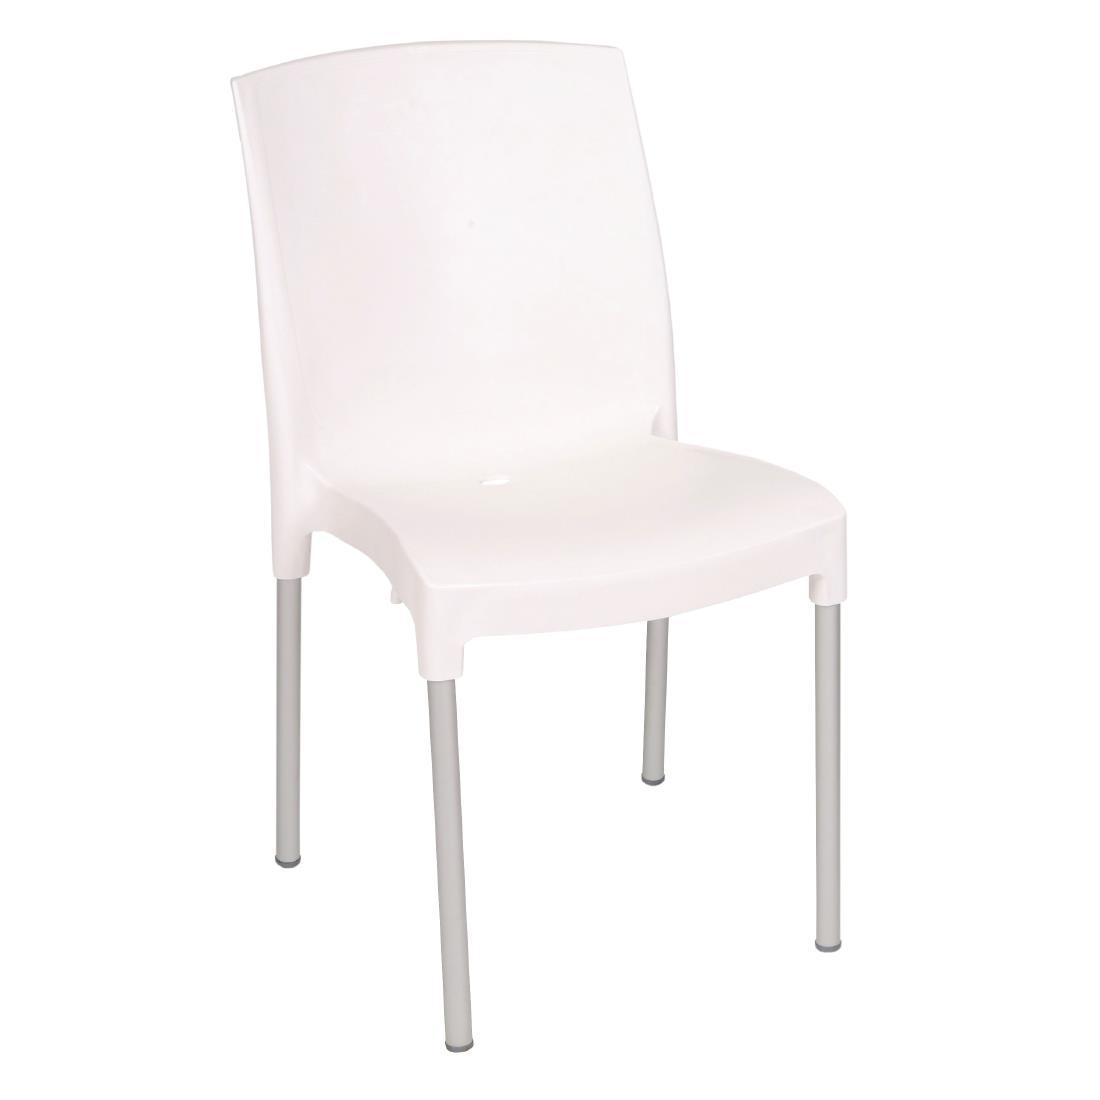 Bistro Side Chair - White